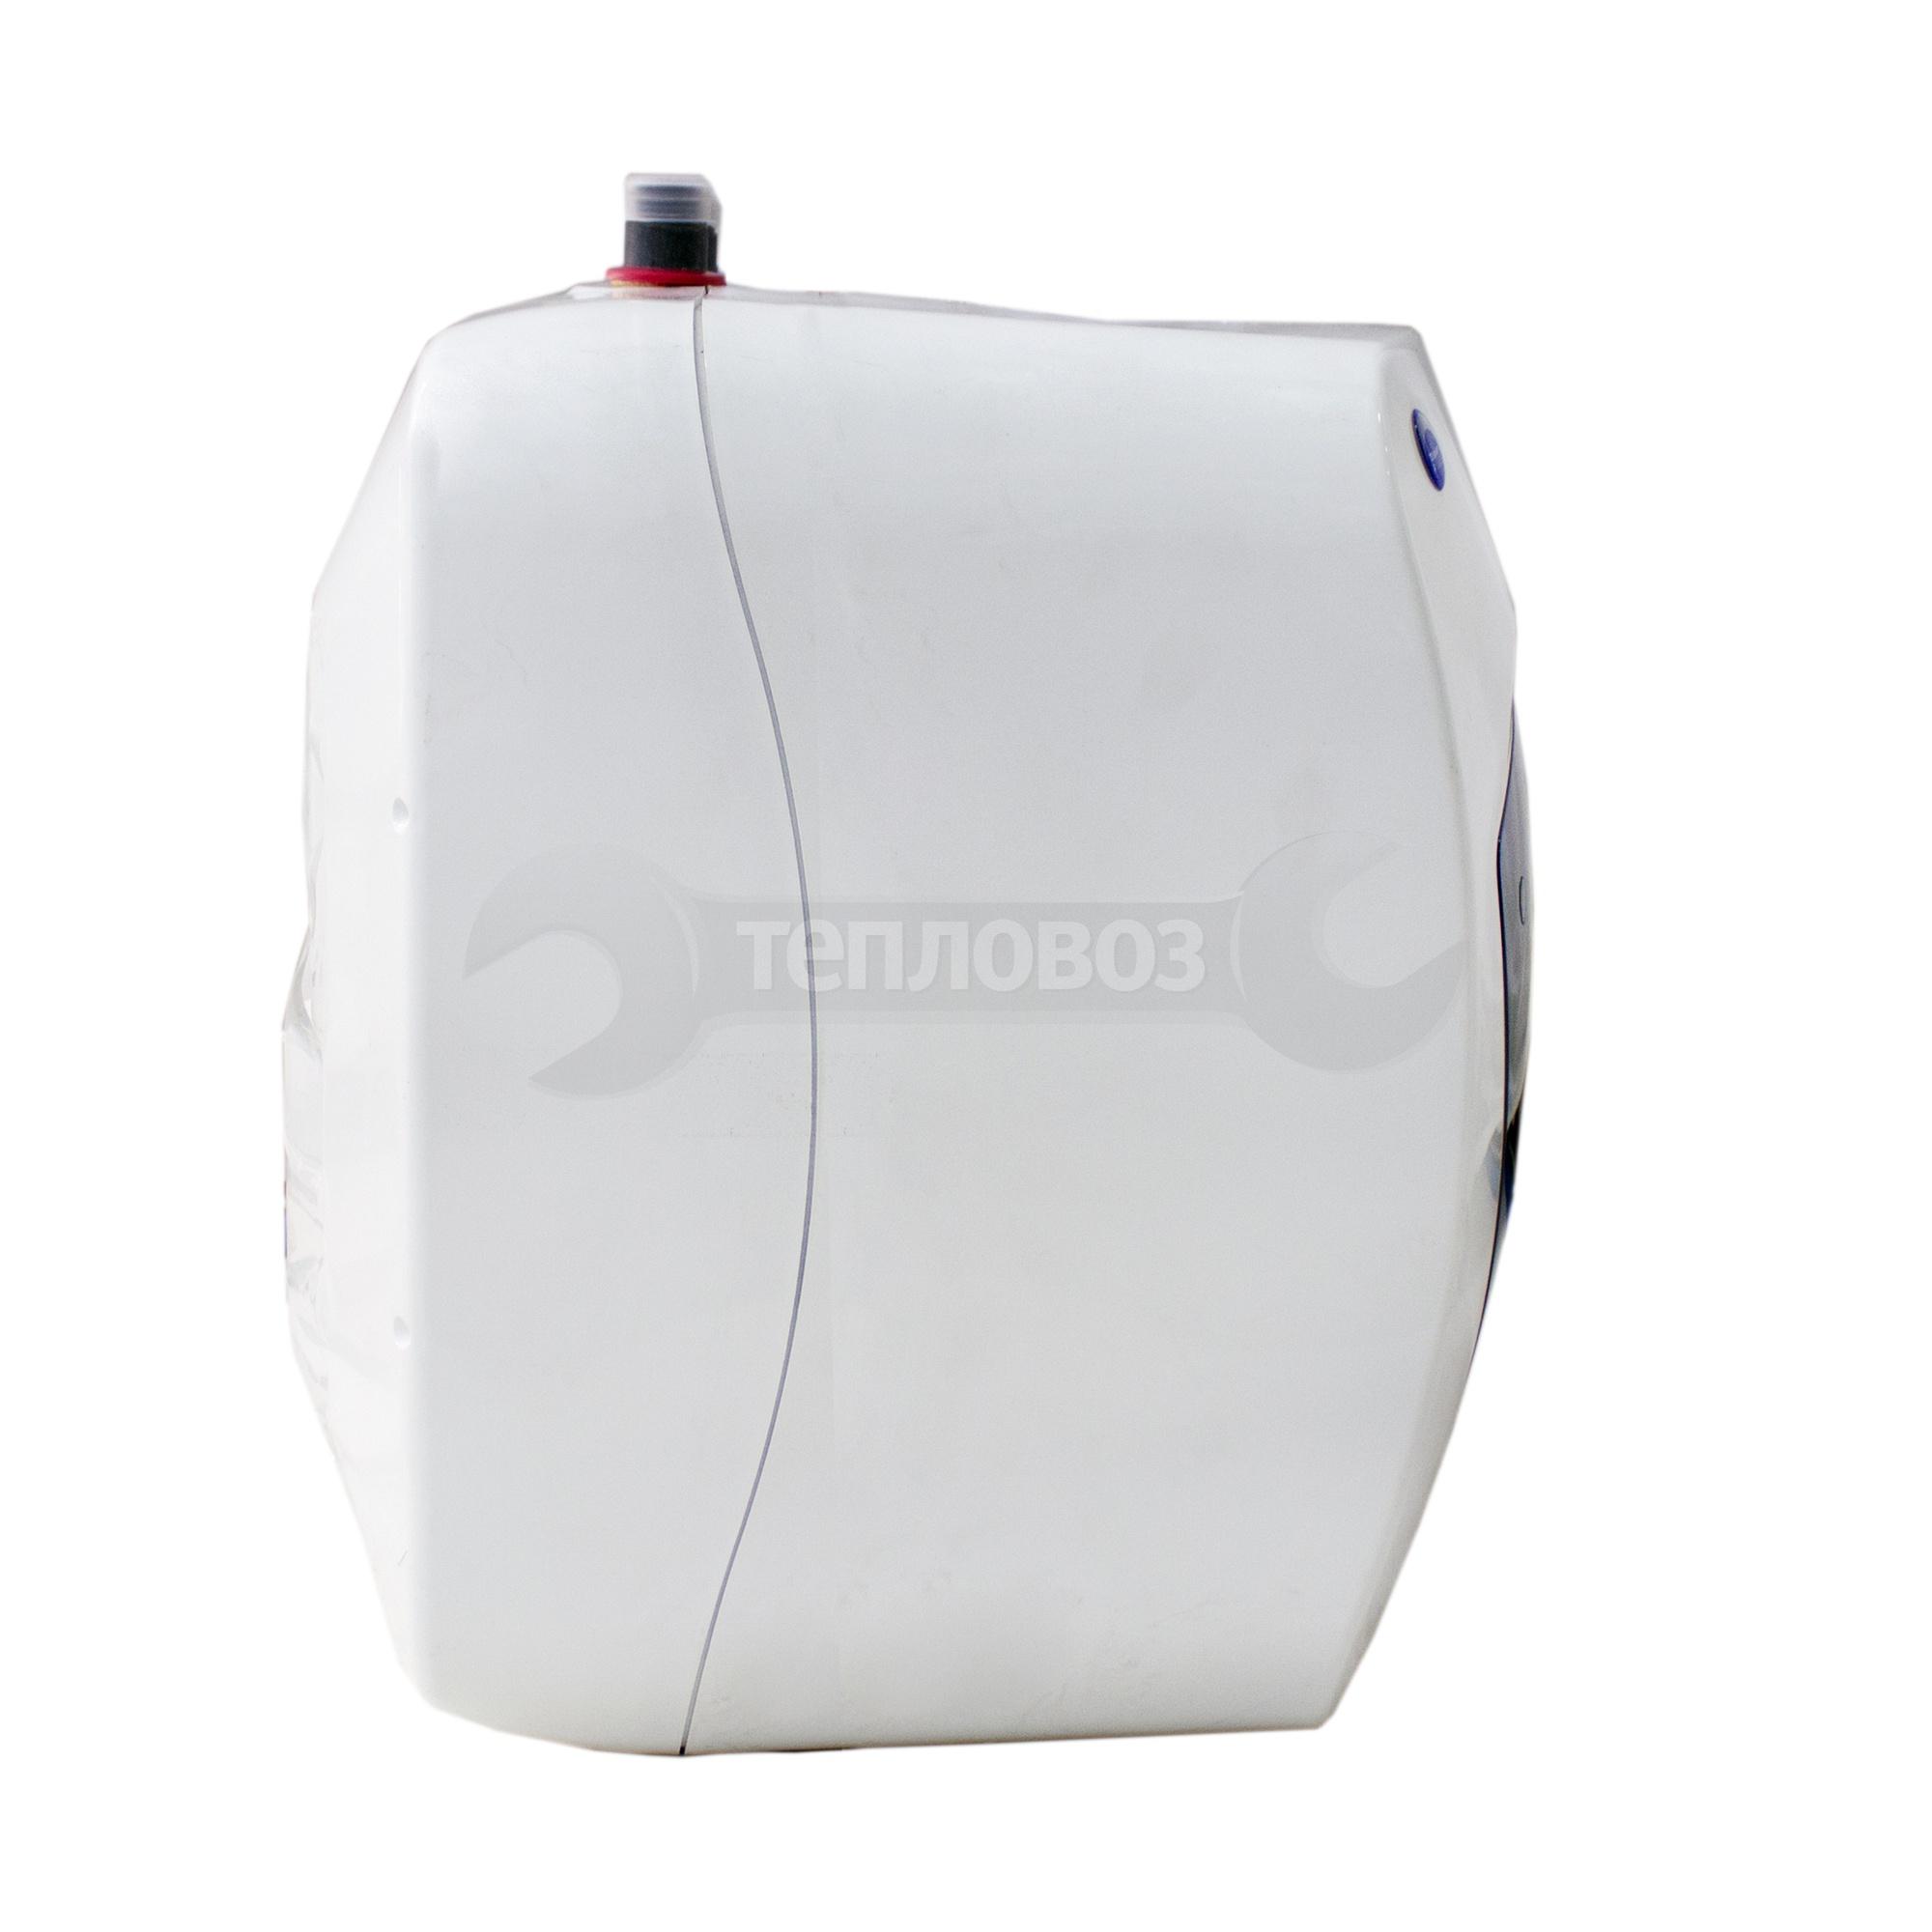 Ariston ABS Andris LUX 15 UR, 15 л